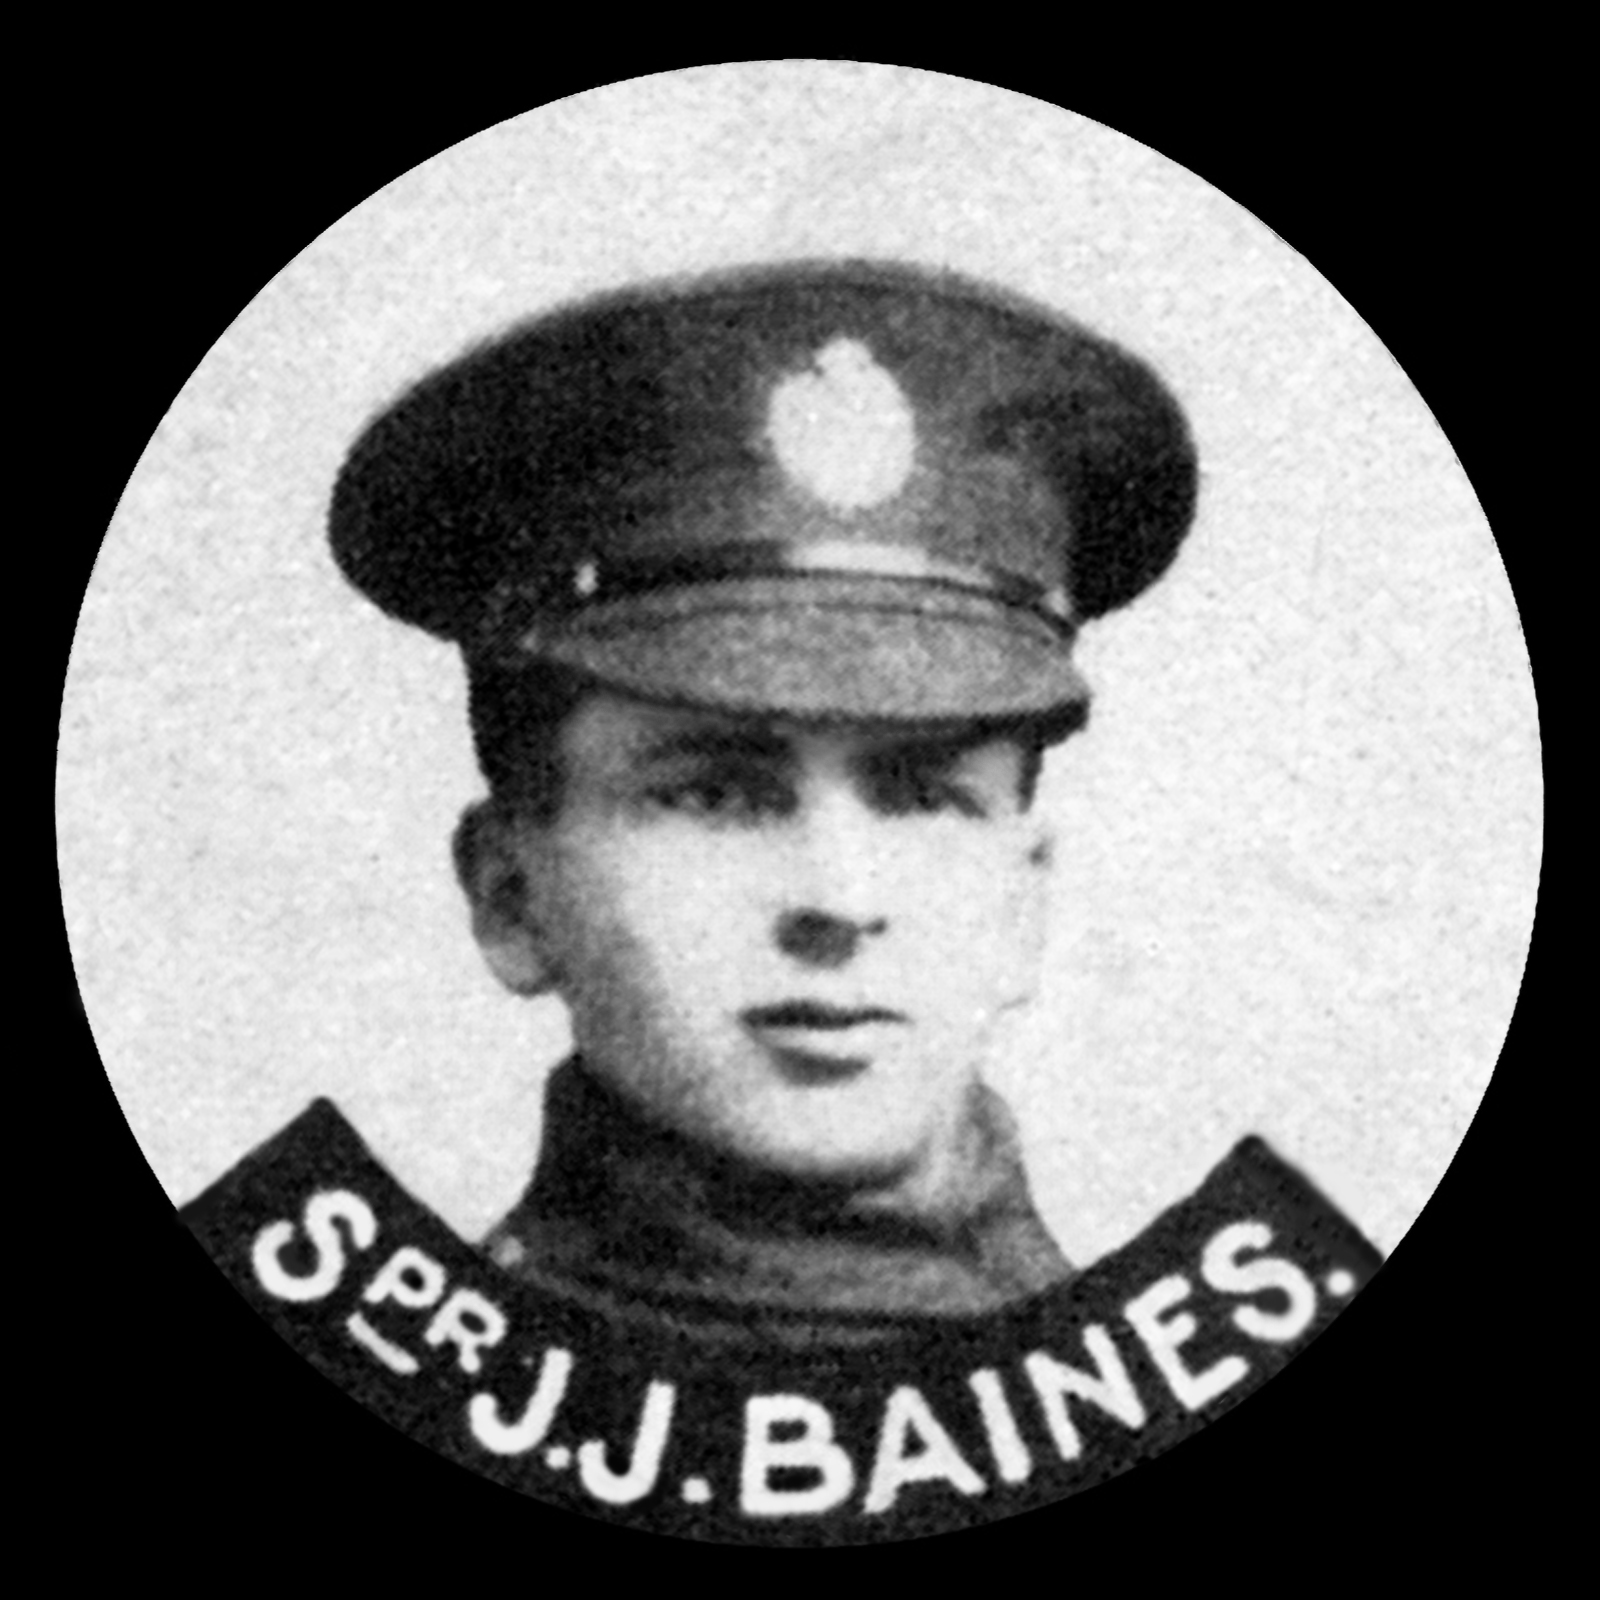 BAINES John Jarvis